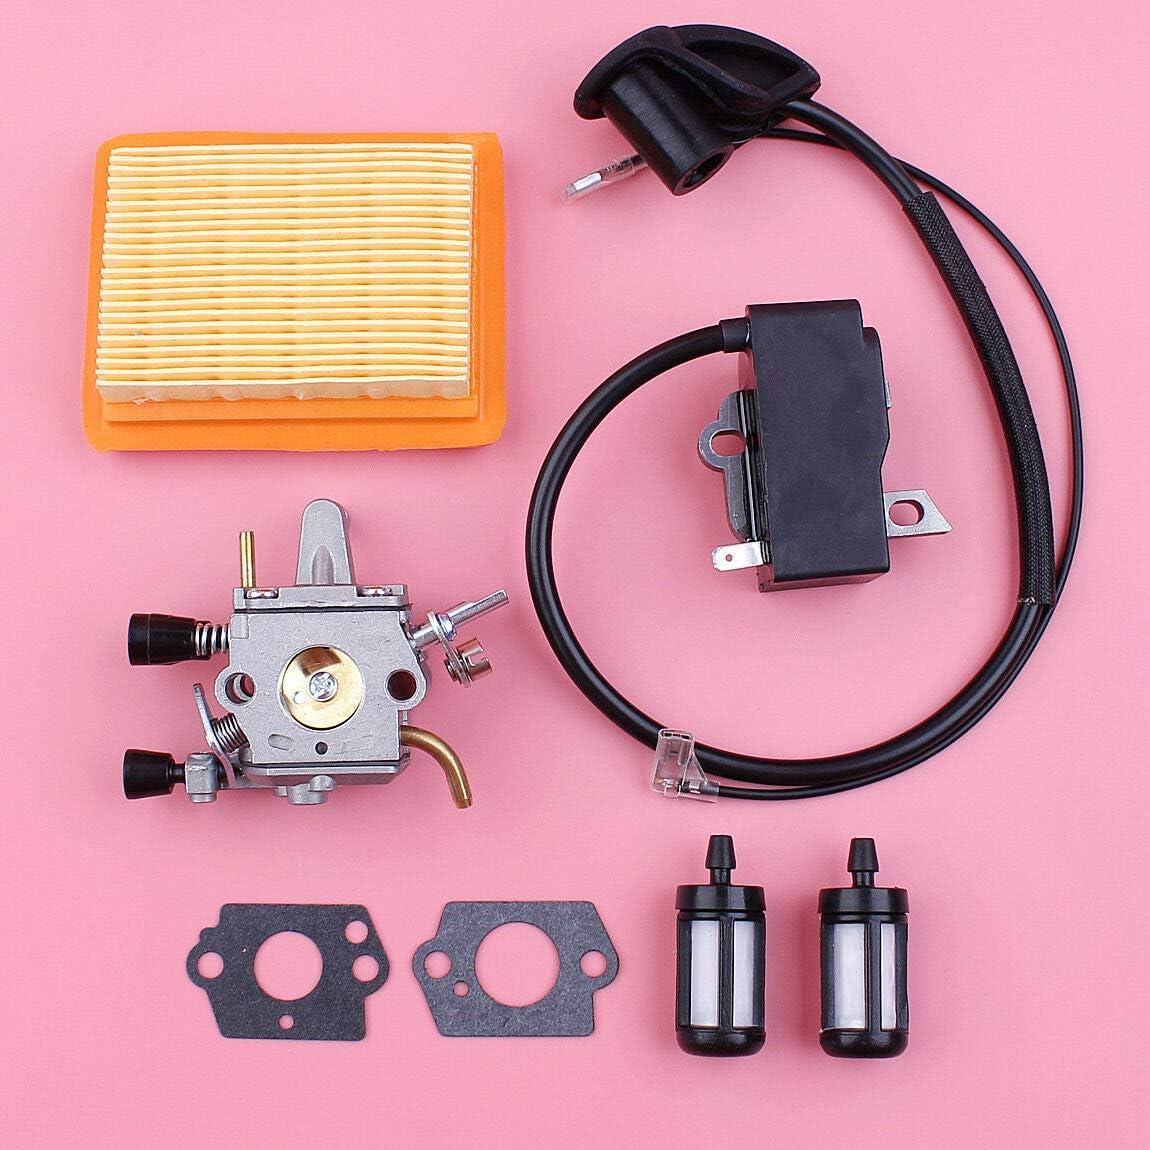 Replacement Sale item Parts for Huq Ignition Under blast sales Air Ki Filter Carburetor Coil